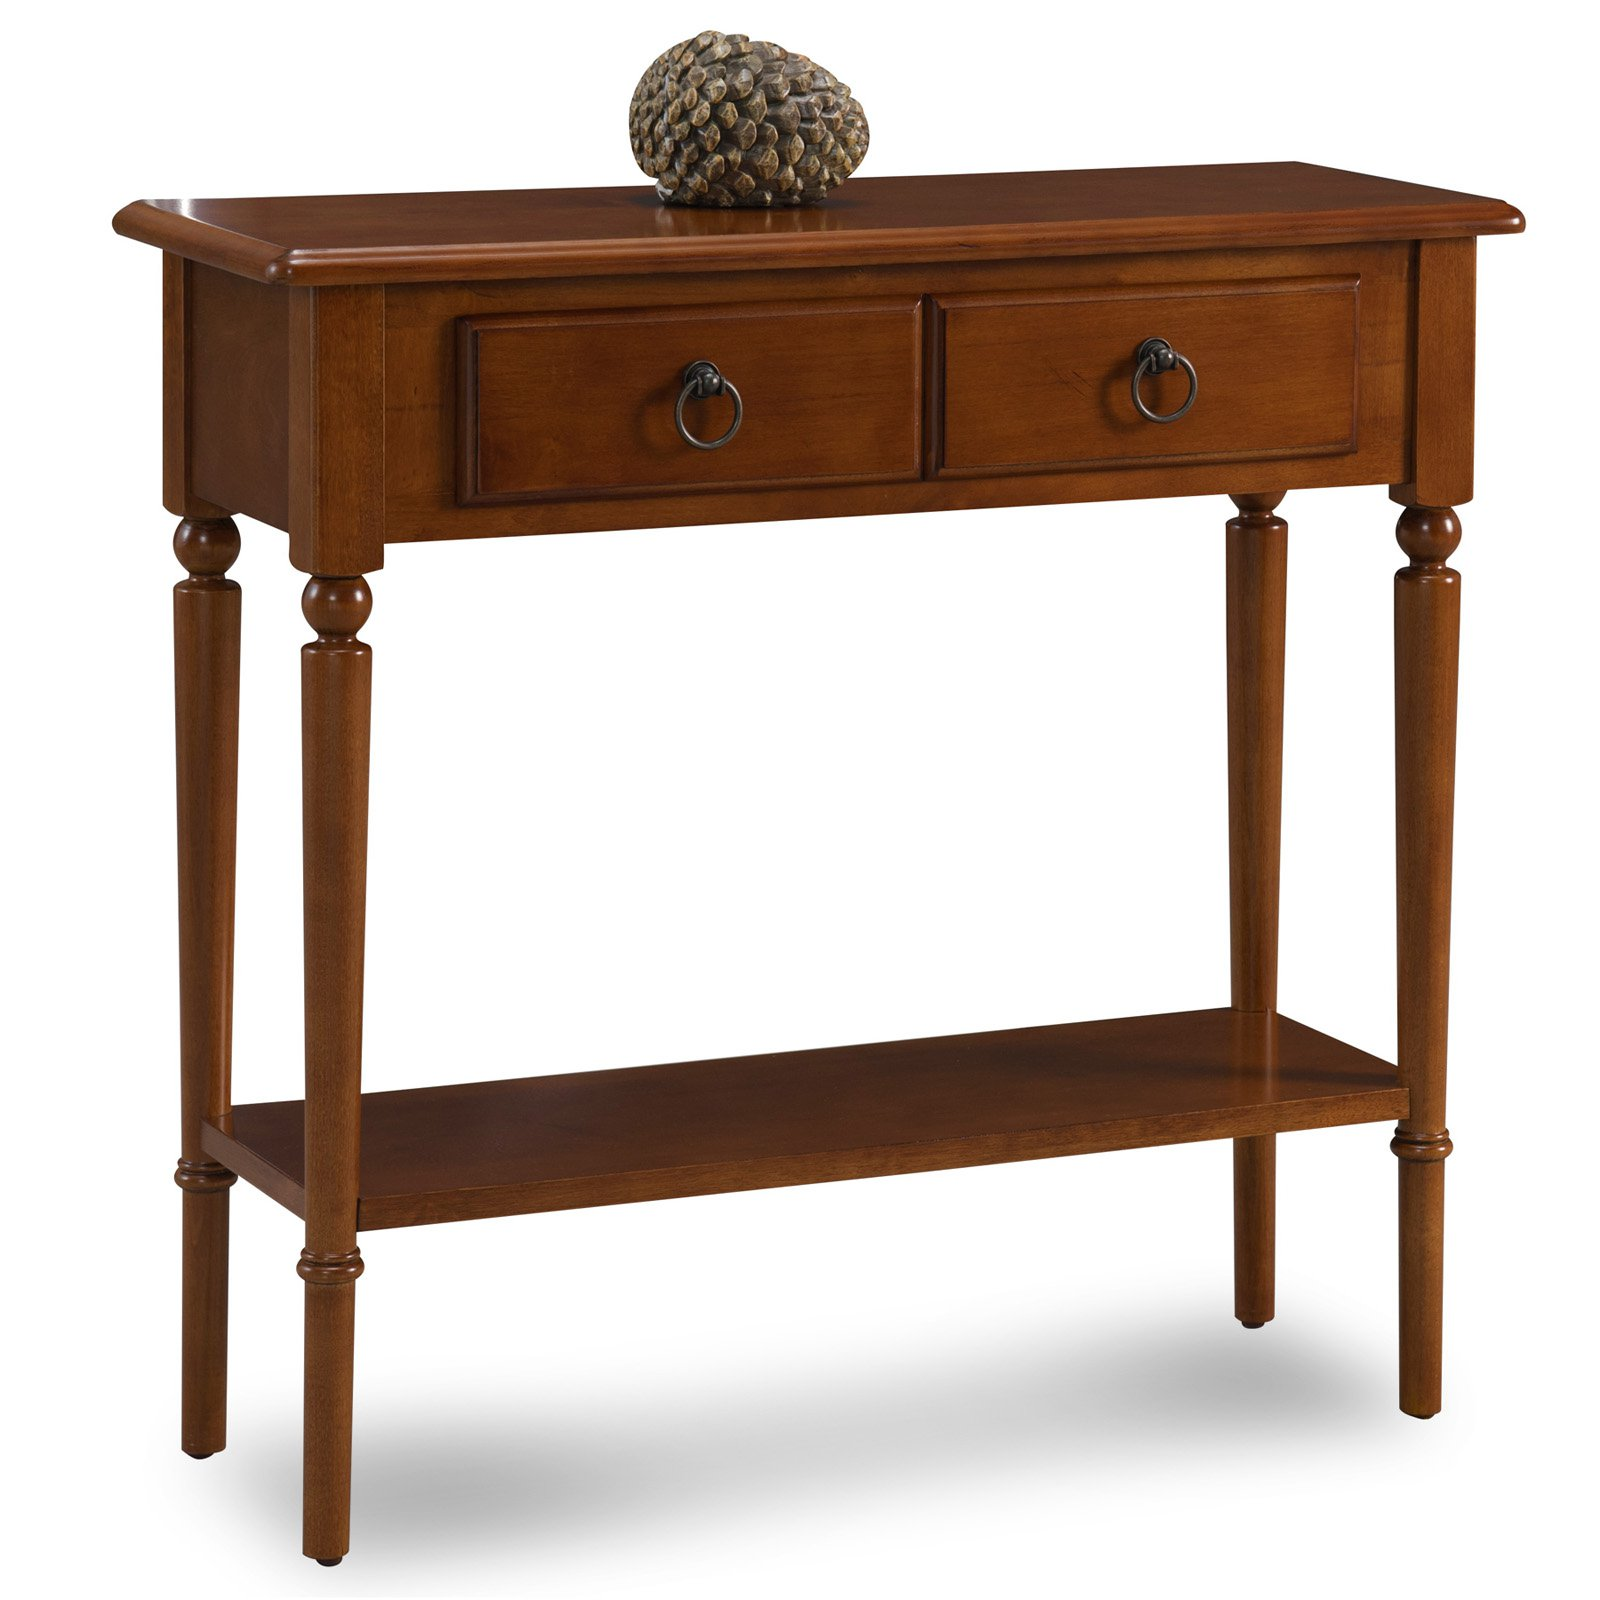 Leick Home Pecan Coastal Narrow Hall Stand/Sofa Table with Shelf